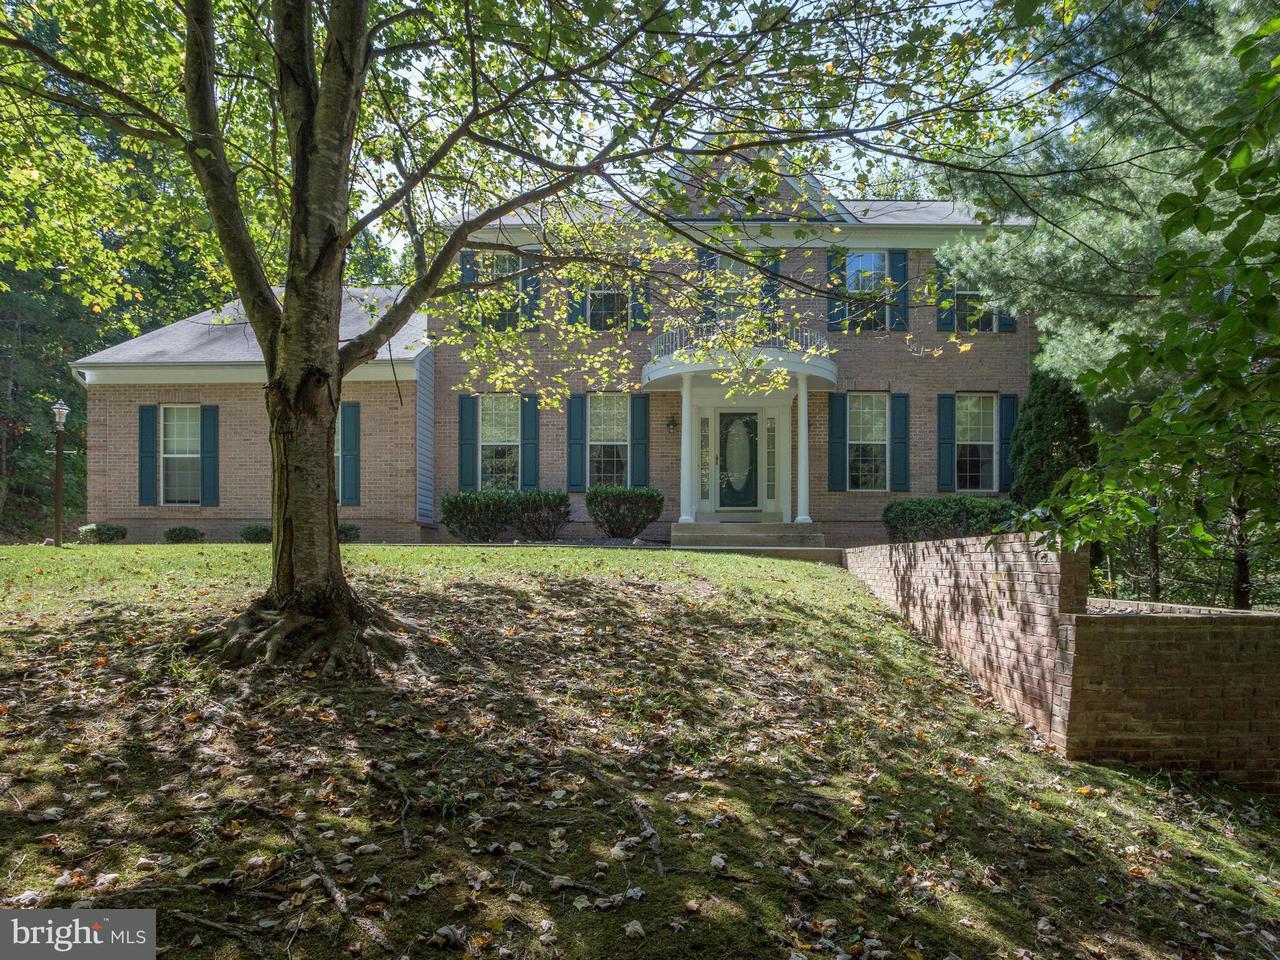 Single Family Home for Sale at 6430 Cherry Ridge Court 6430 Cherry Ridge Court Manassas, Virginia 20112 United States